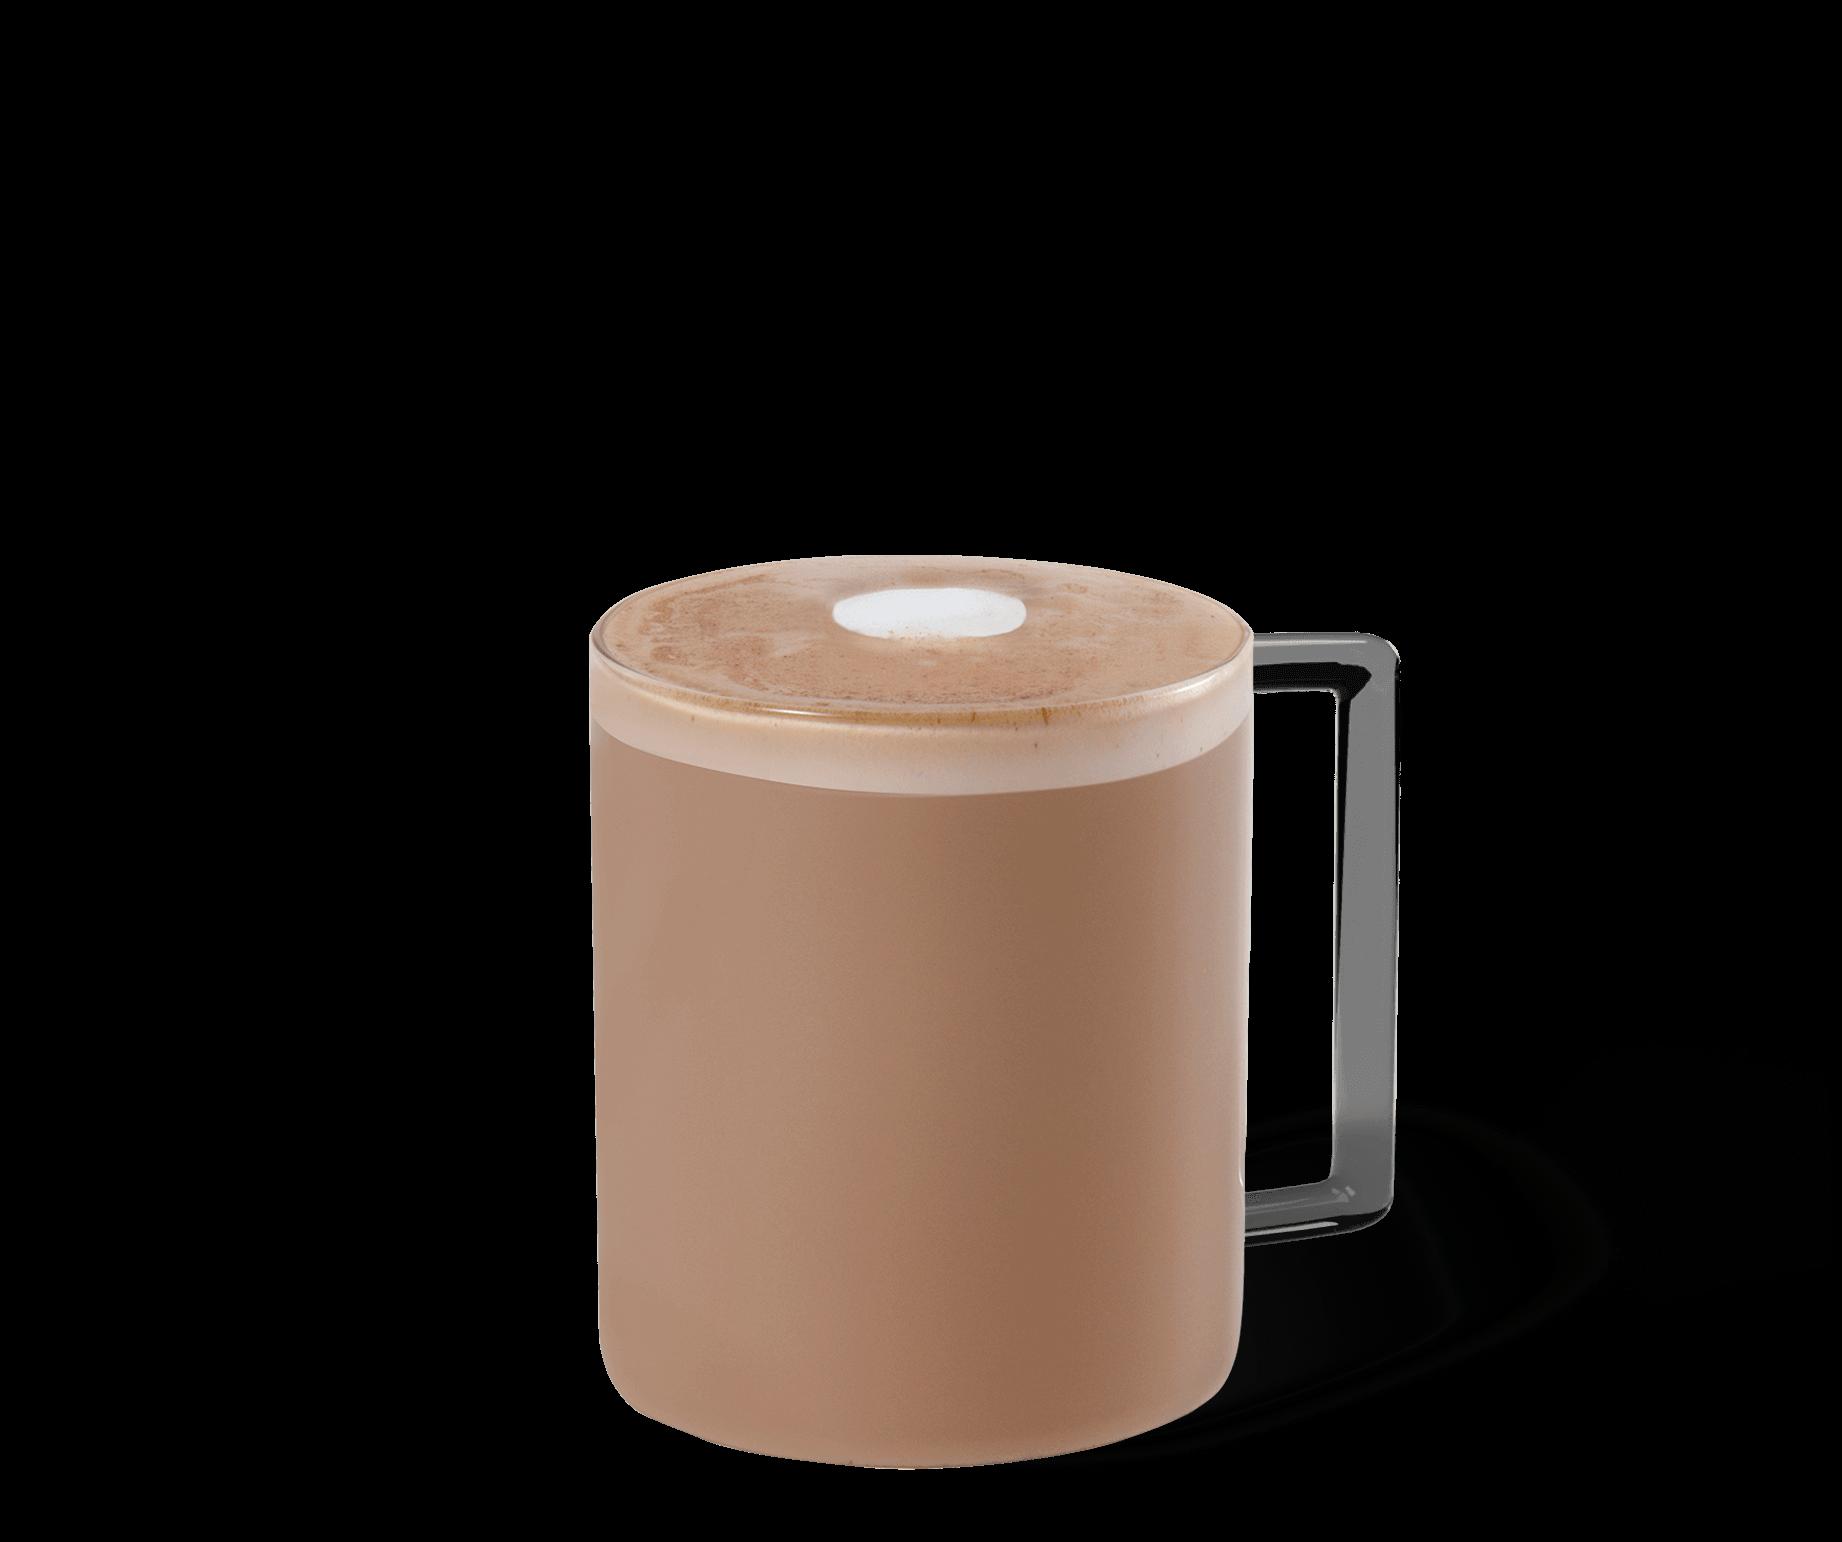 SpicedExpresso_LongShadow_Cream.png